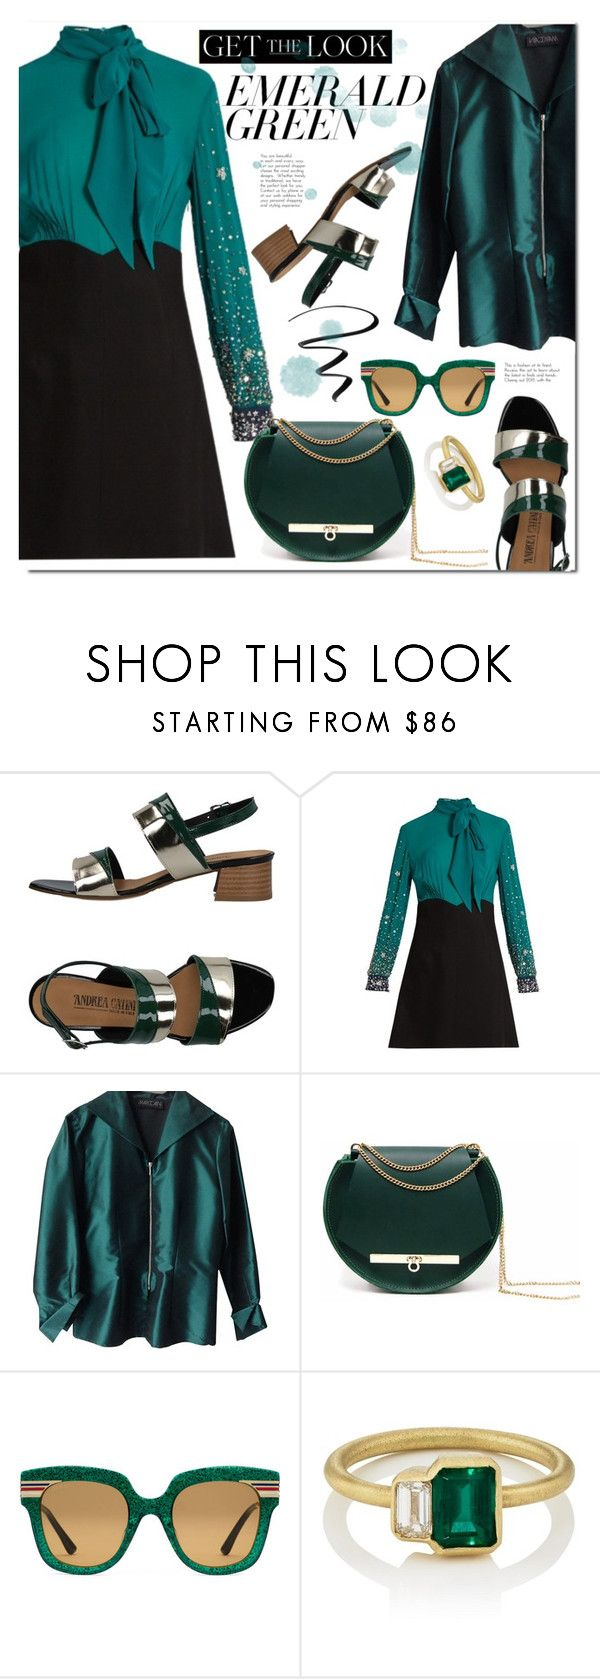 Emerald Gren Cute Outfits Miu Miu Handbags Miu Miu